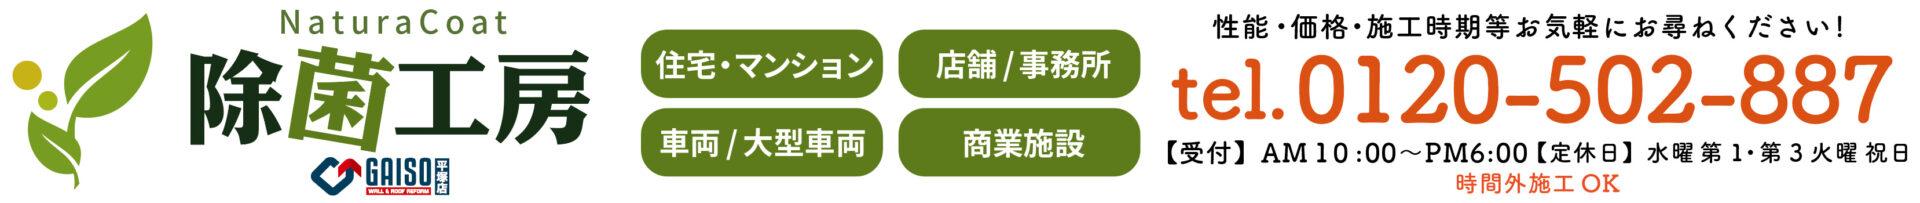 hiratsuka-header20200714